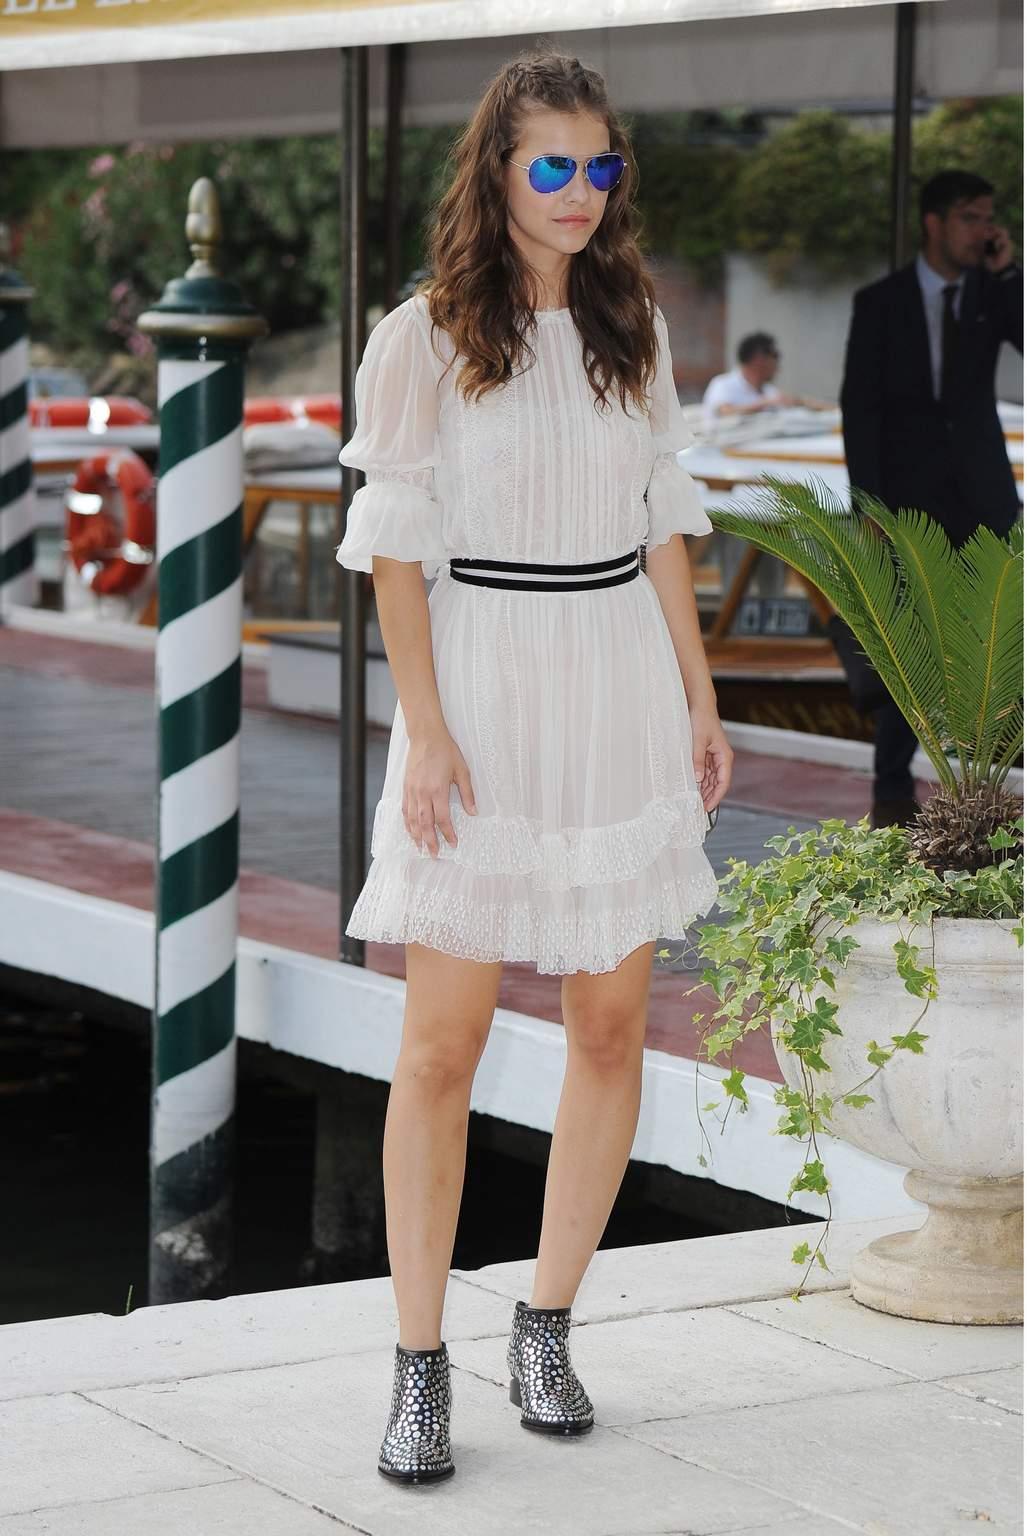 Hot & Sexy Model Barbara Palvin Arrives At Venice Film Festival In Venice - HD Photos